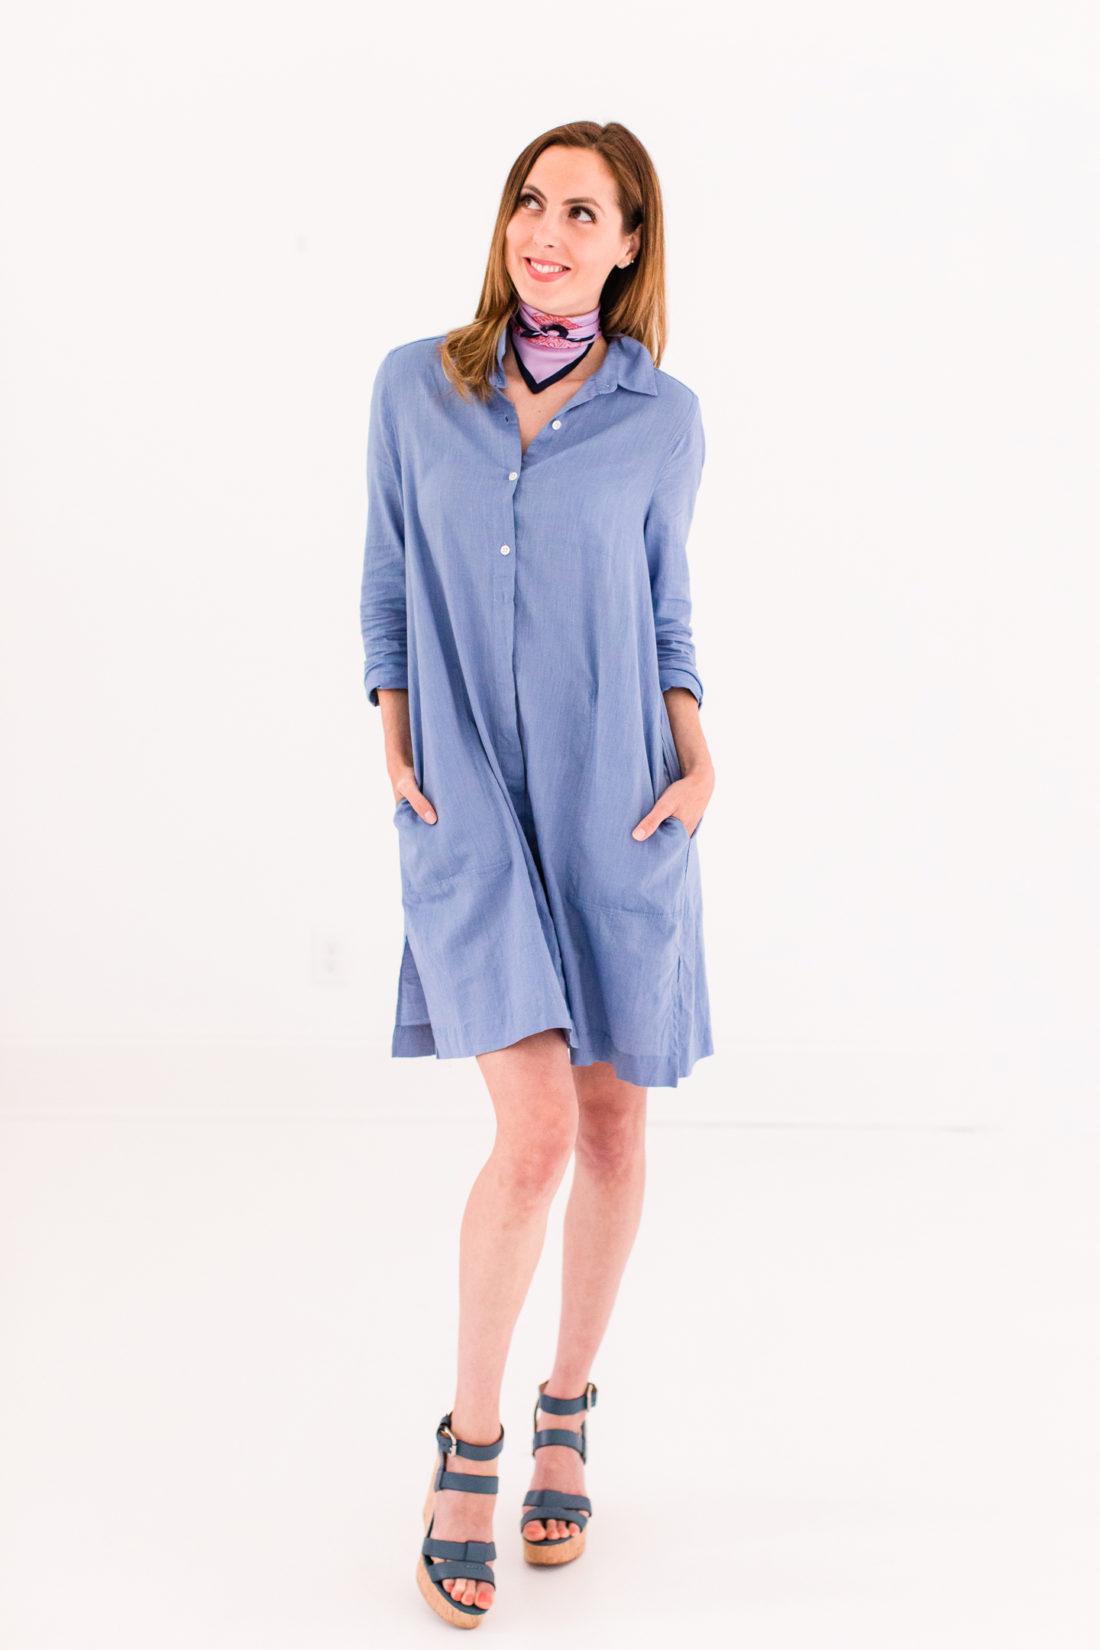 Eva Amurri Martino wears a light blue shirtdress and a silk scarf bandana tied around her neck